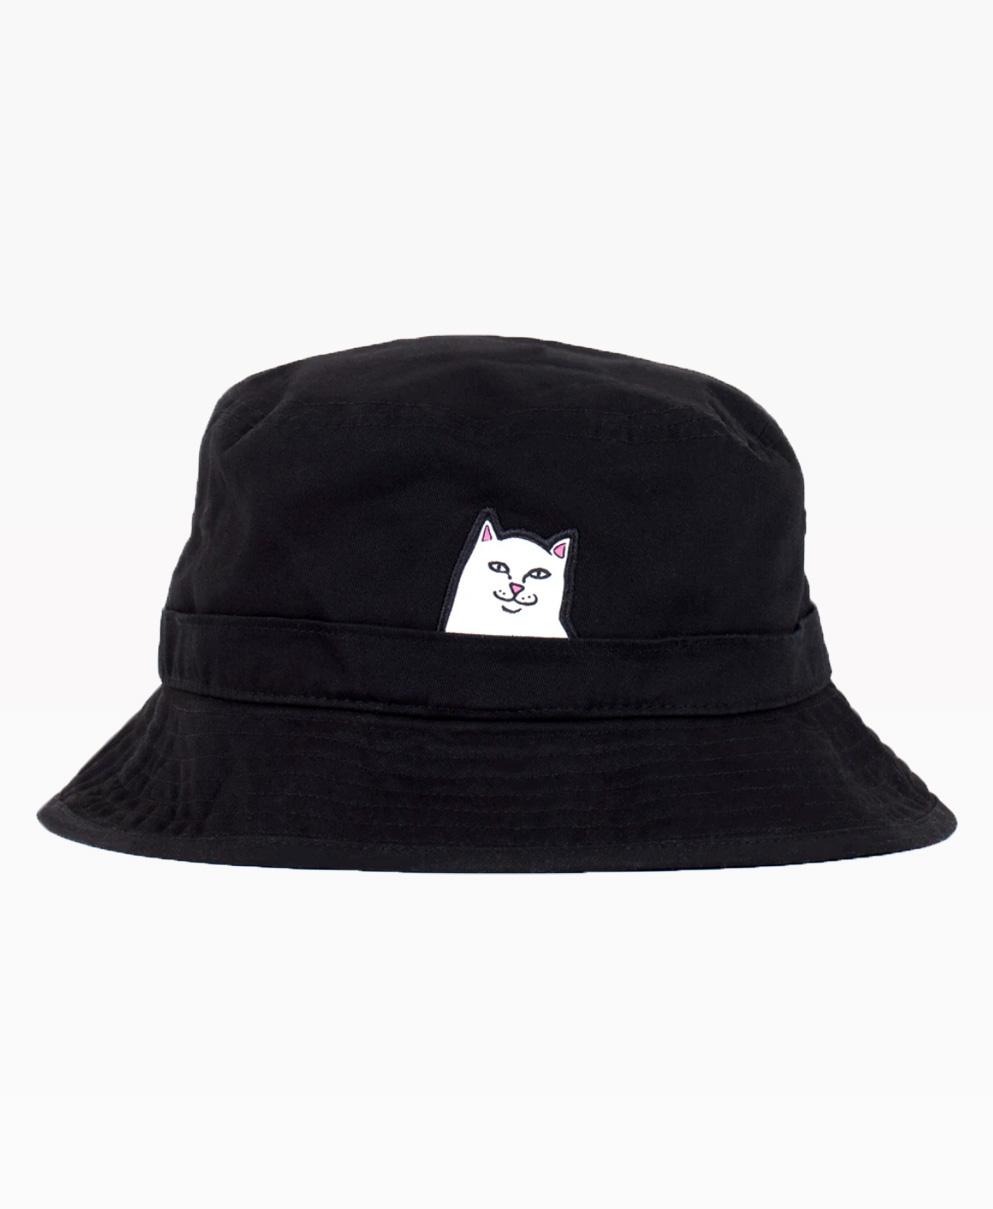 Ripndip Lord Nermal Bucket Hat Black Front